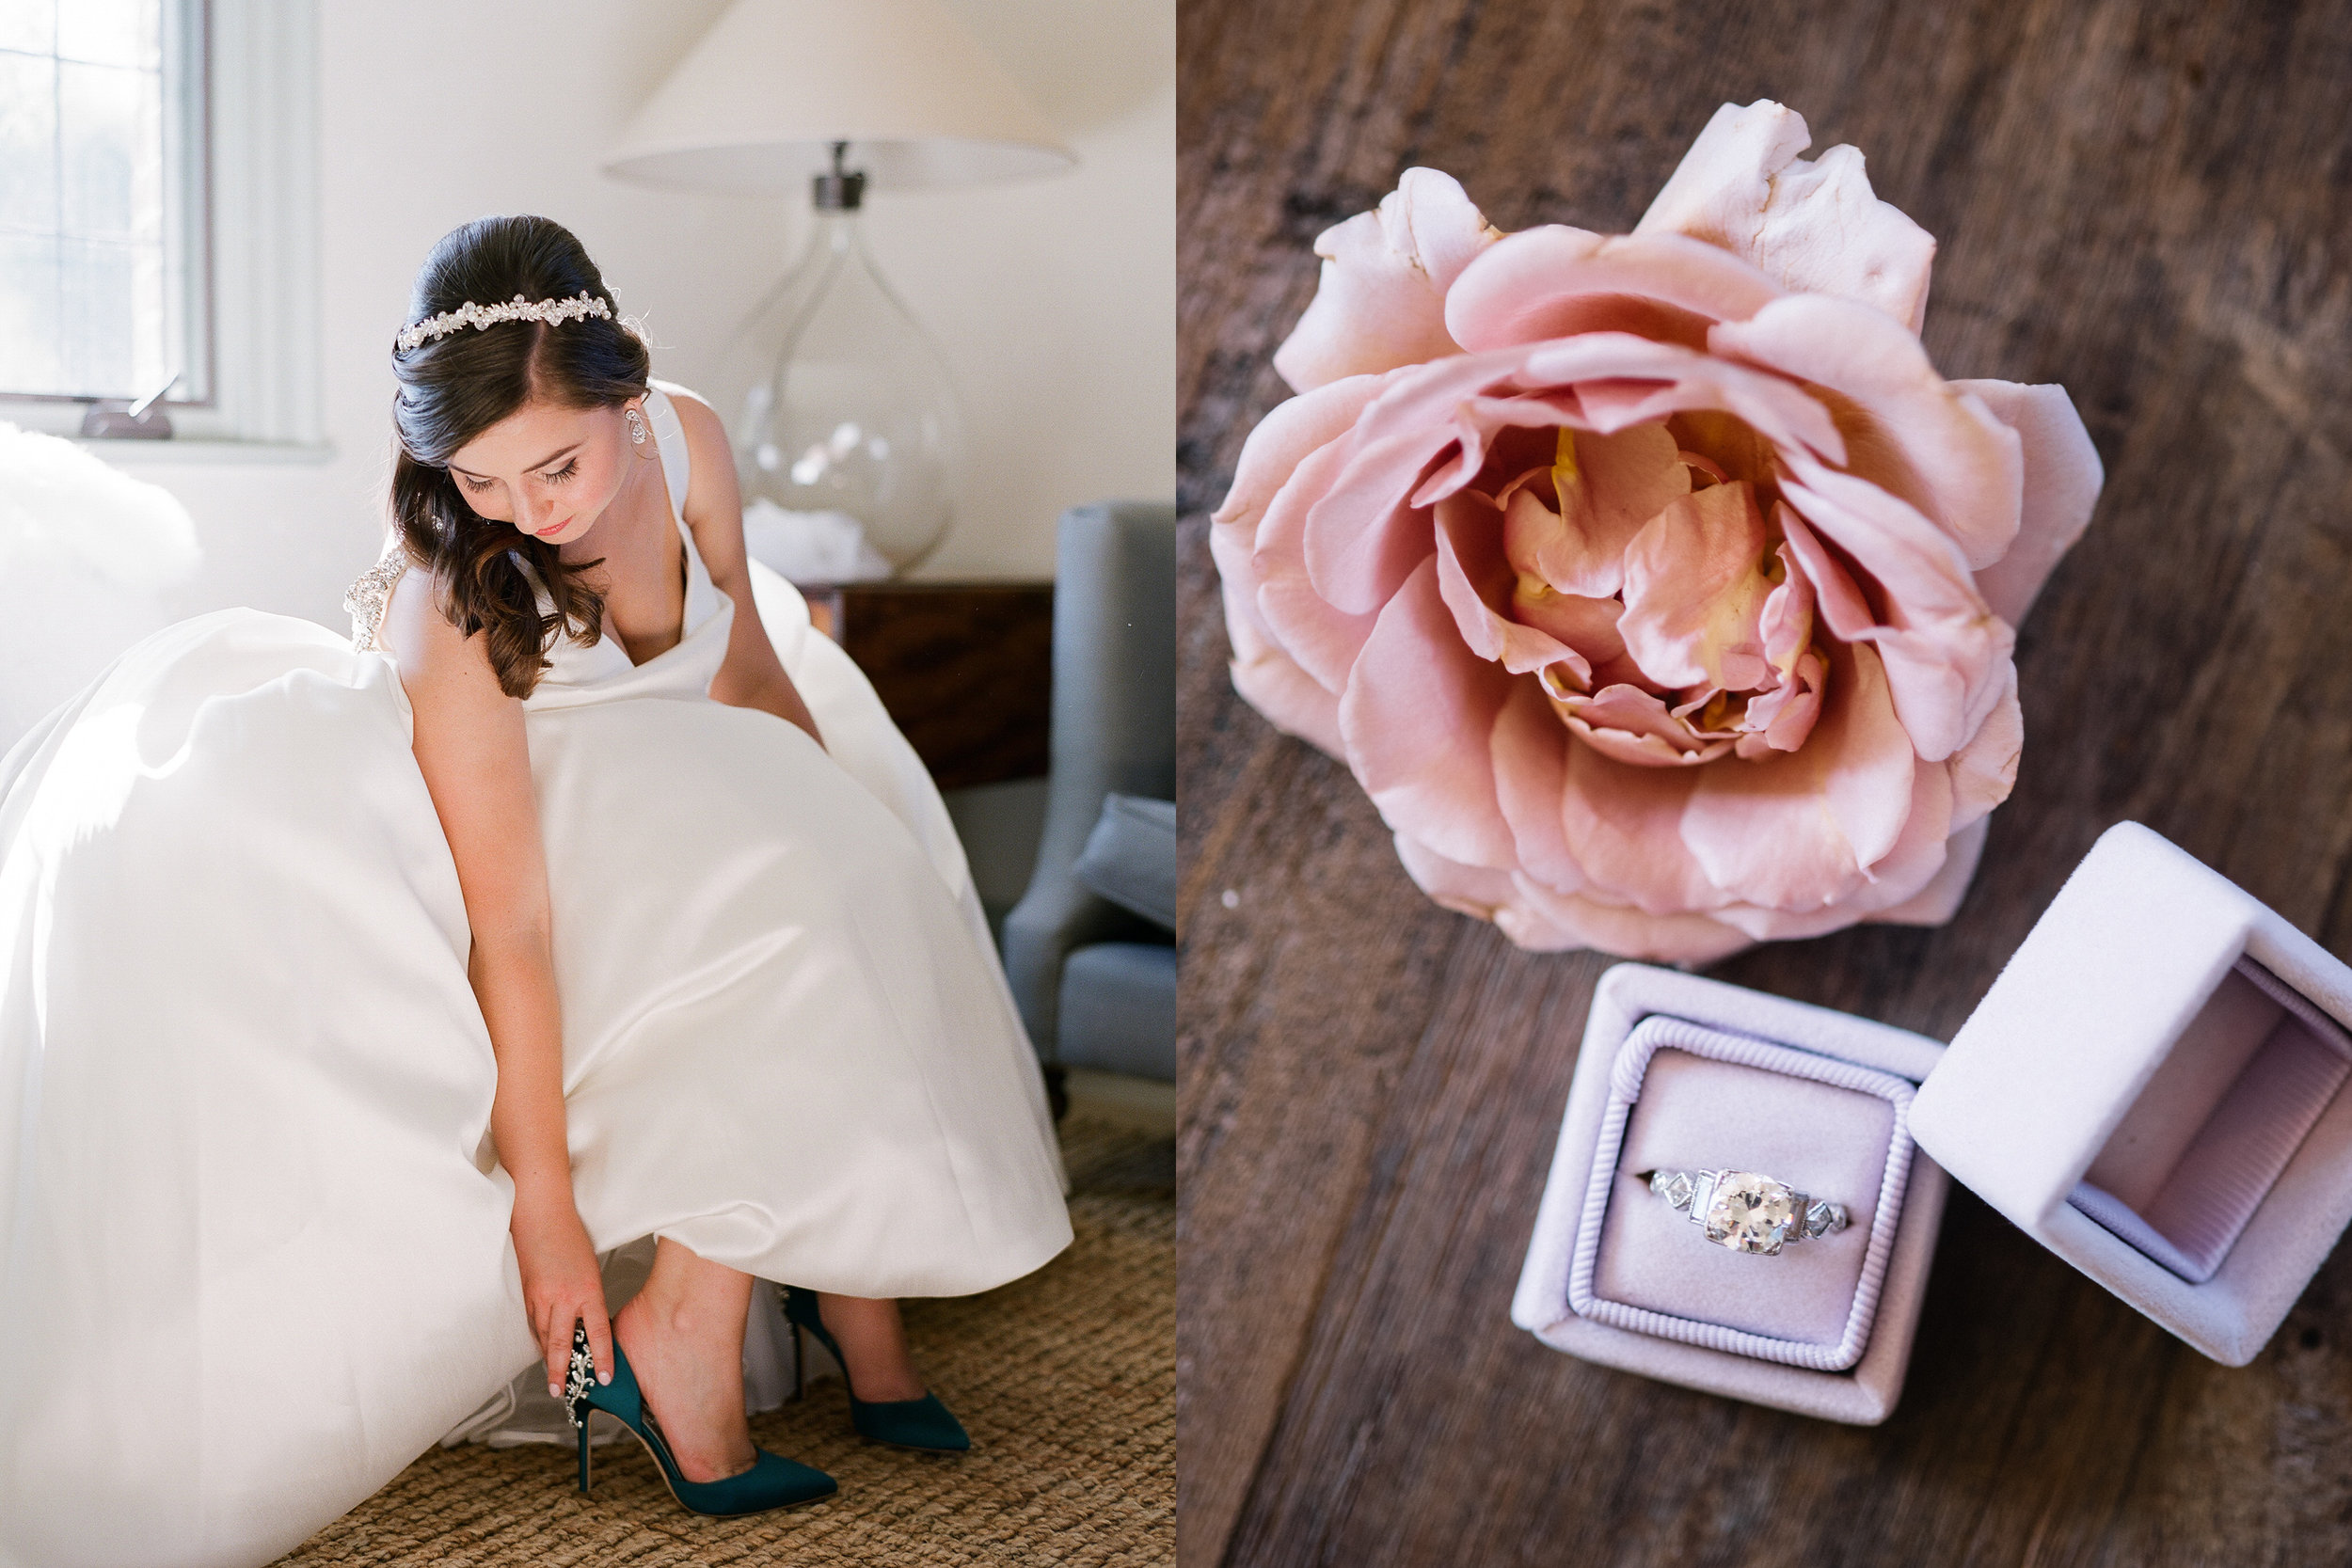 santa-barbara-elopement-elope-wedding-planner-planning-coordinator-day-of-intimate-event-design-kestrel-park-santa-ynez-english-country-estate-garden-castle (4).jpg